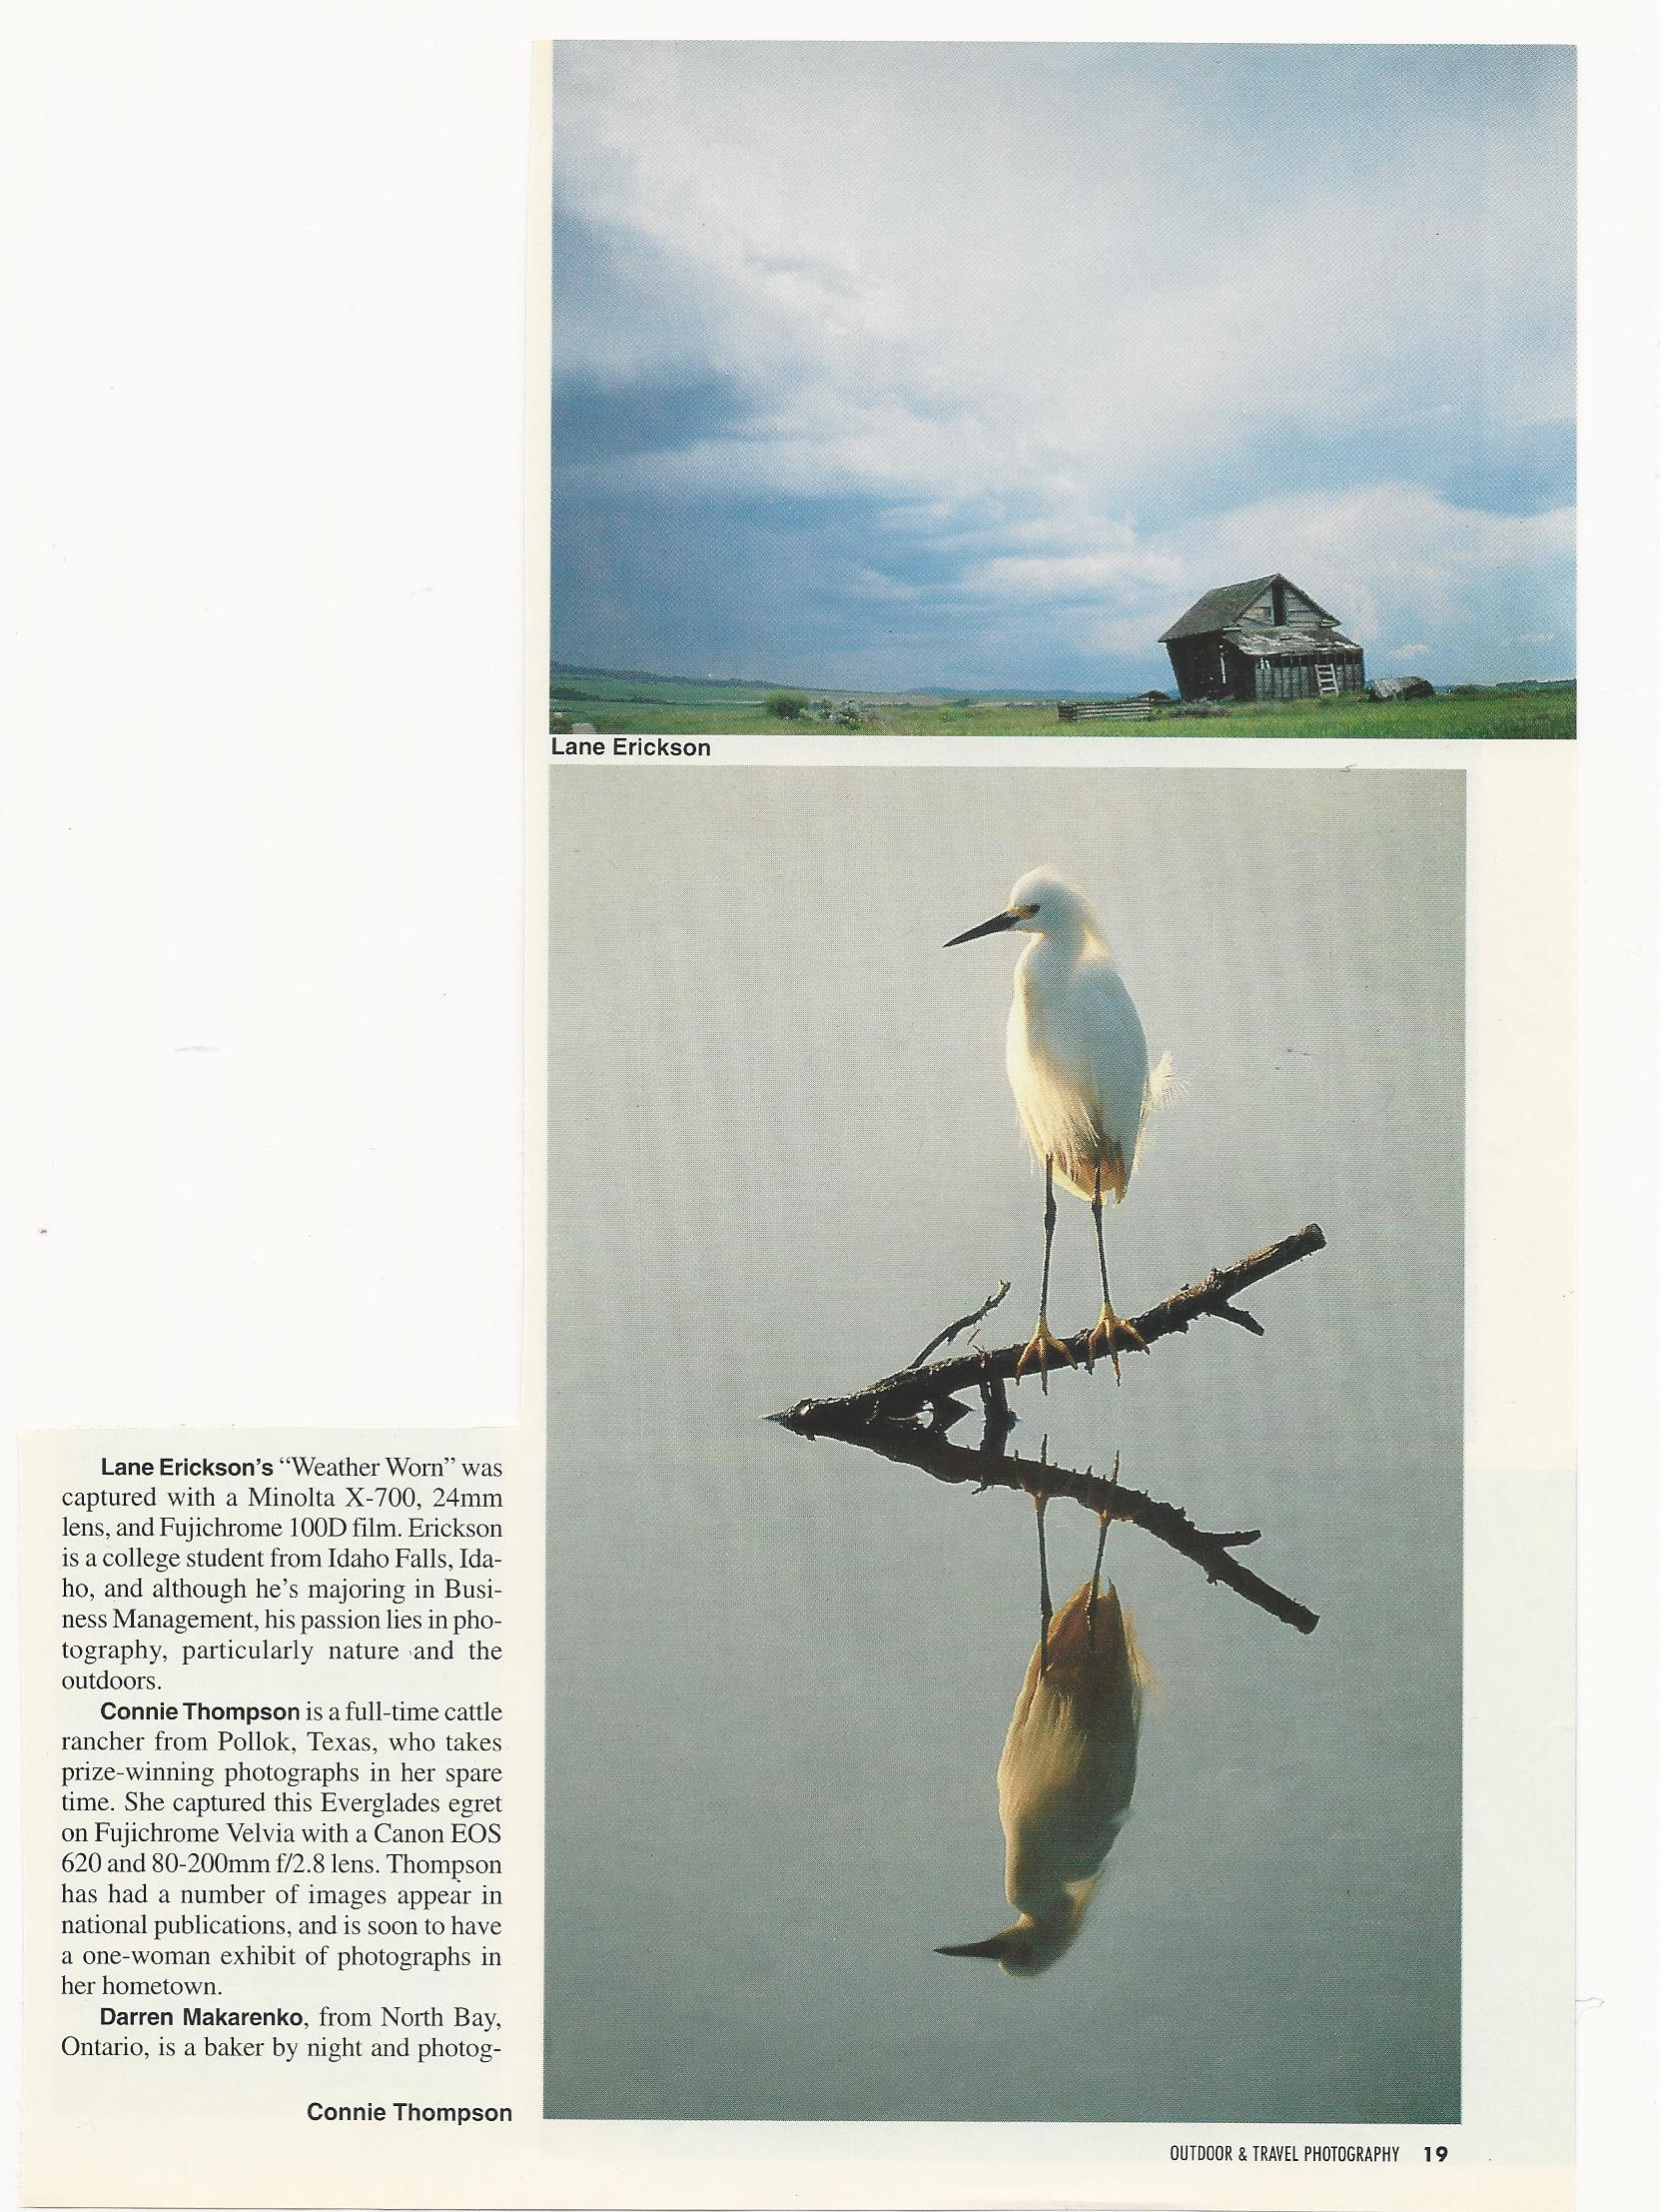 Outdoor & Travel Photographer